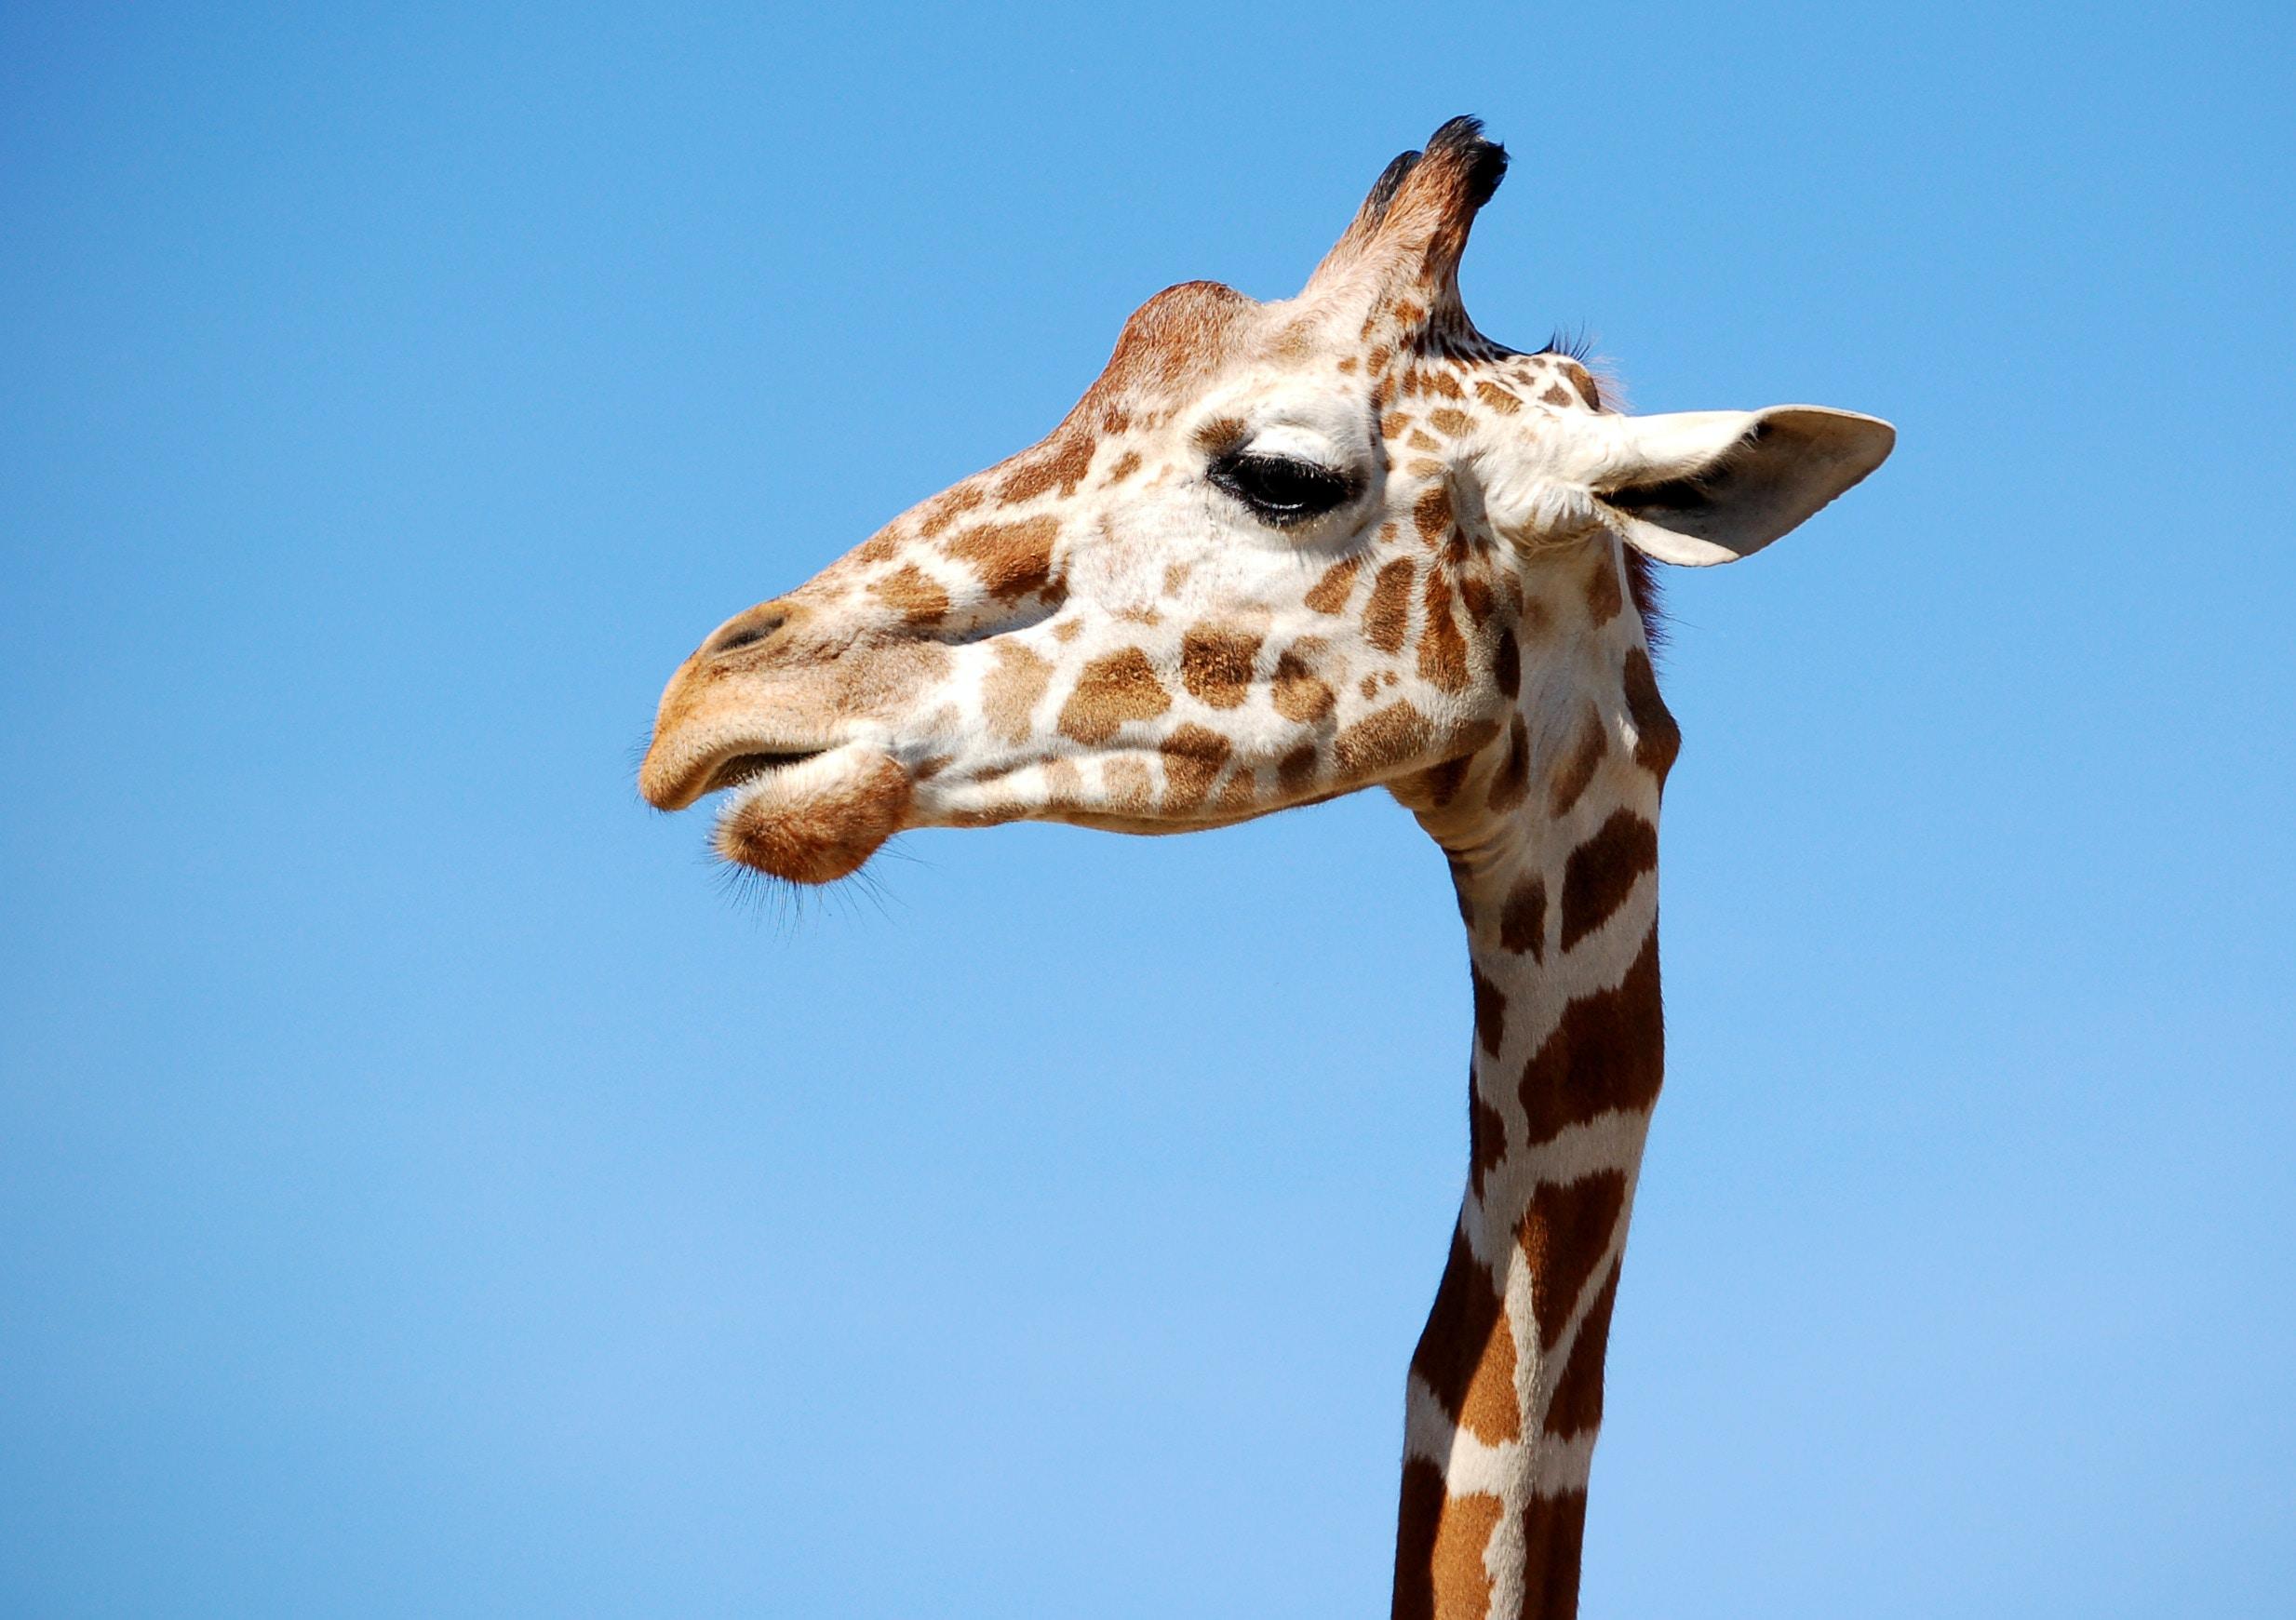 close view of giraffe's head